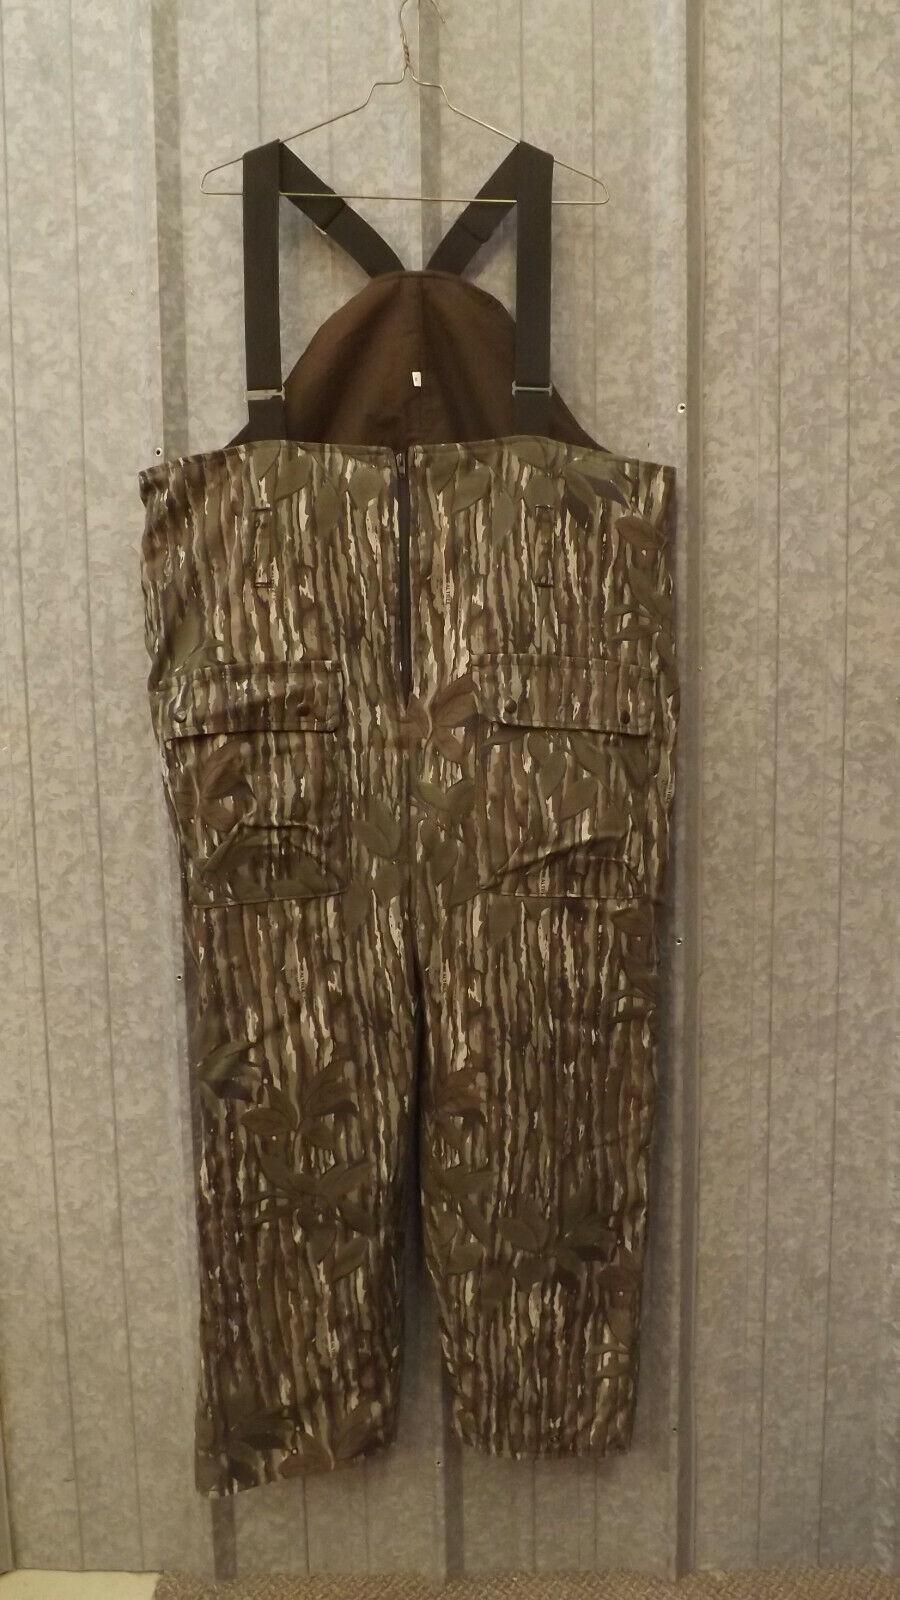 Vtg NEW Realtree Green Leaf Camo Thintech Waterproof Bibs Sz XXL Johnson Garment